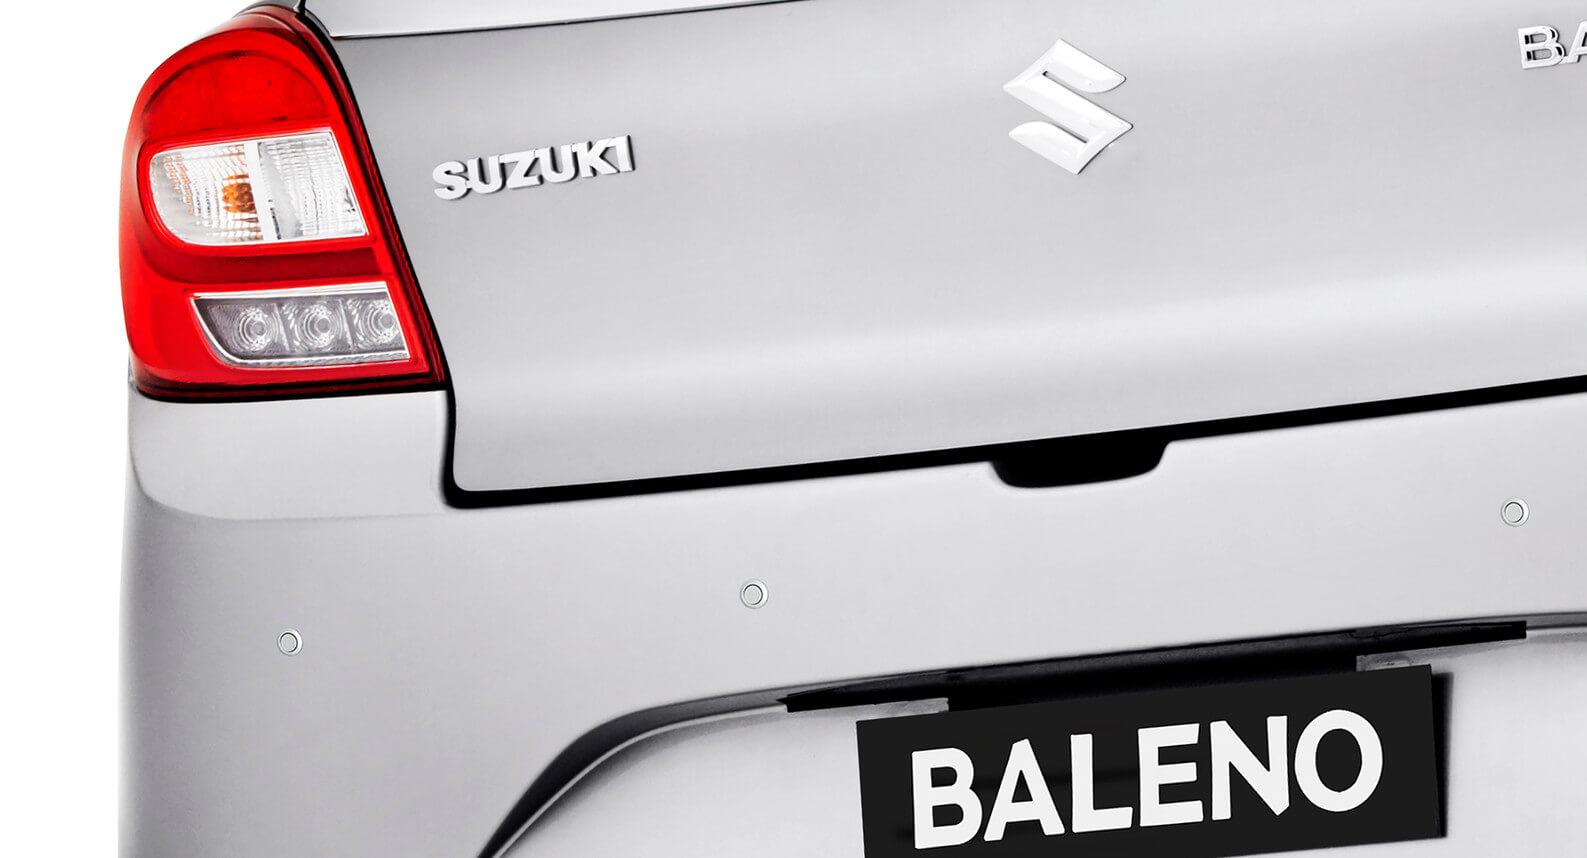 Baleno - Rear Parking Sensors